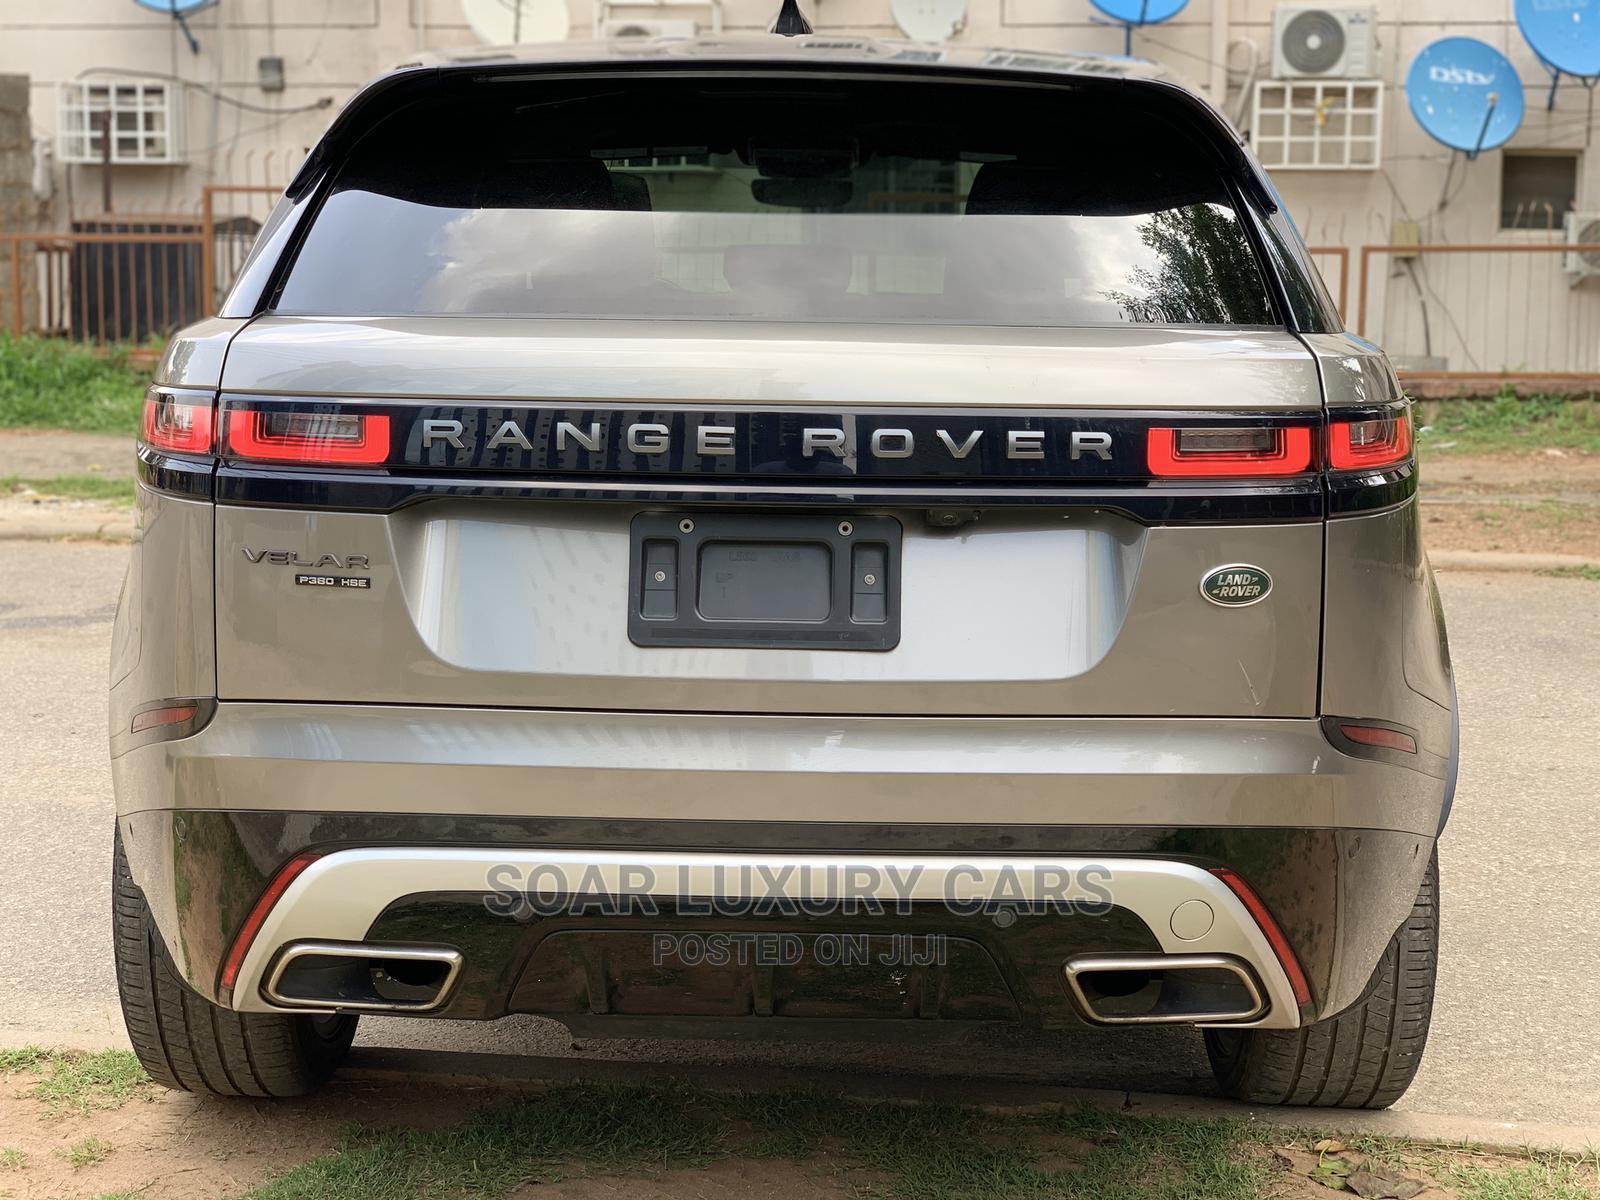 Archive: Land Rover Range Rover Velar 2018 P380 HSE R-Dynamic 4x4 Gray